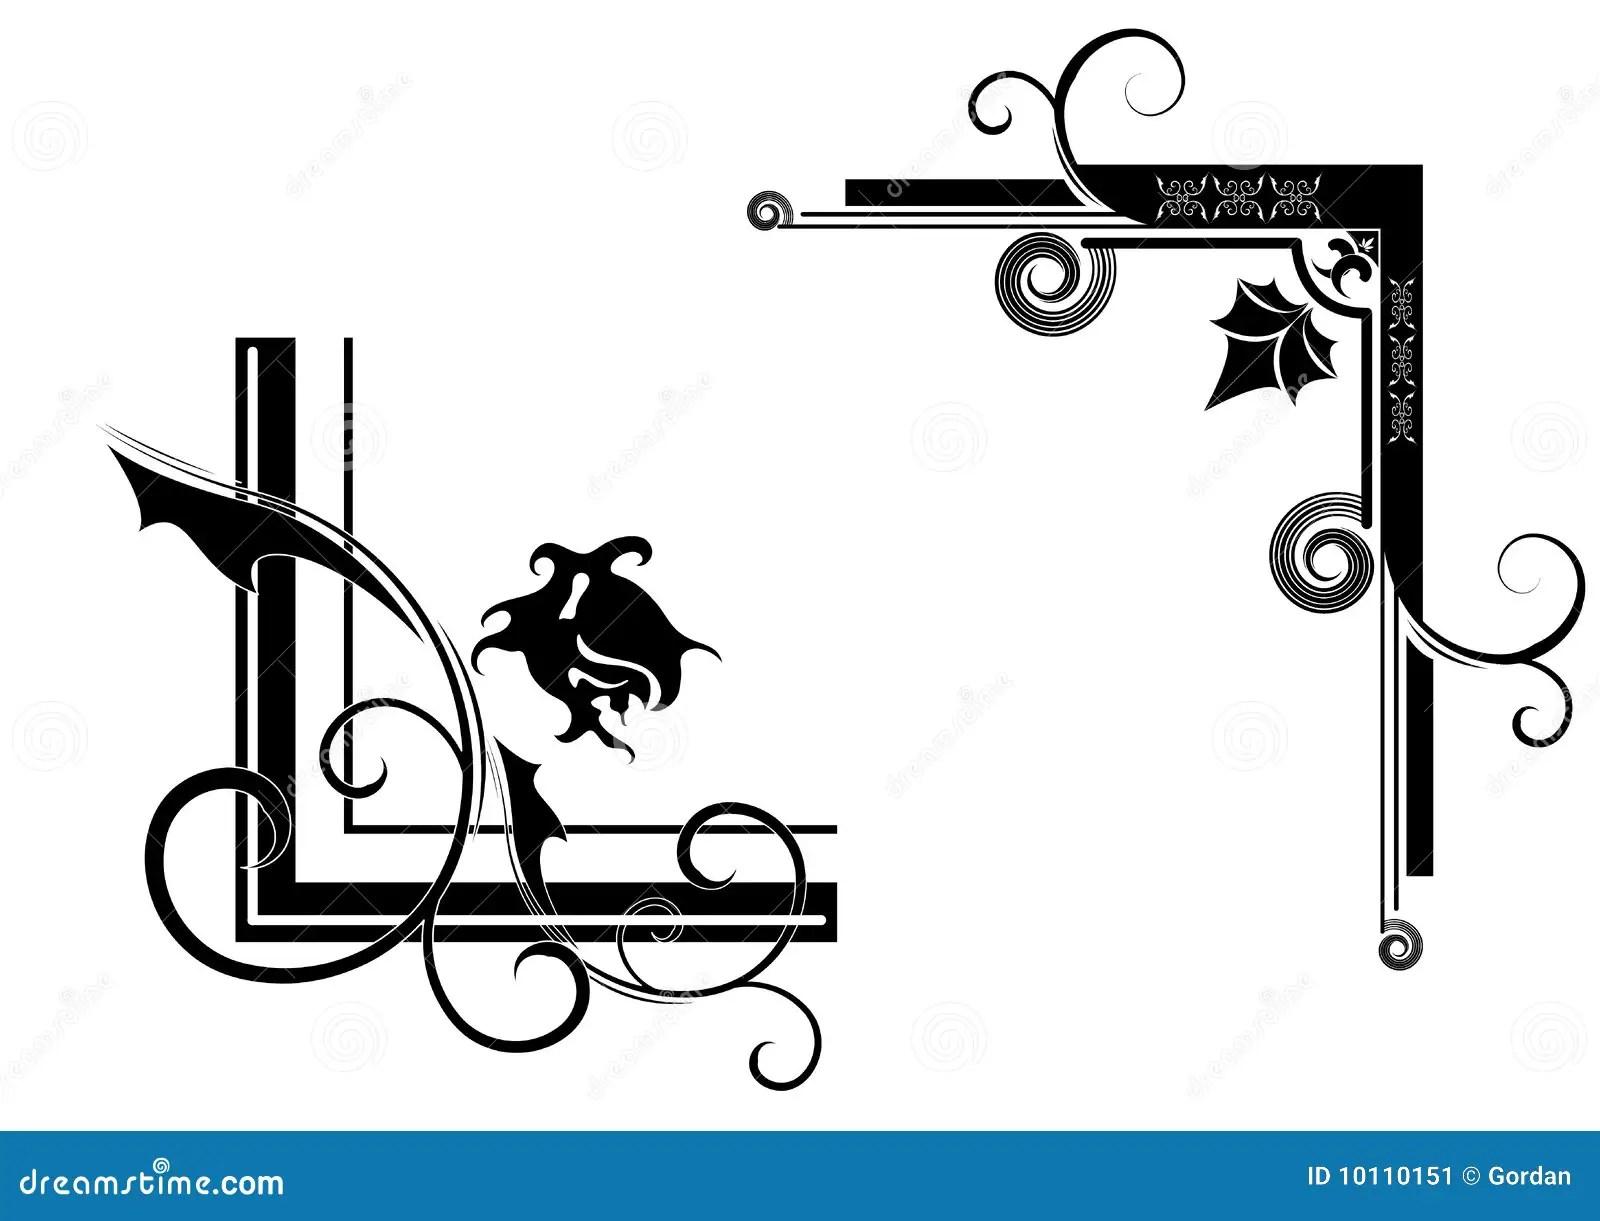 Design Corners Stock Image